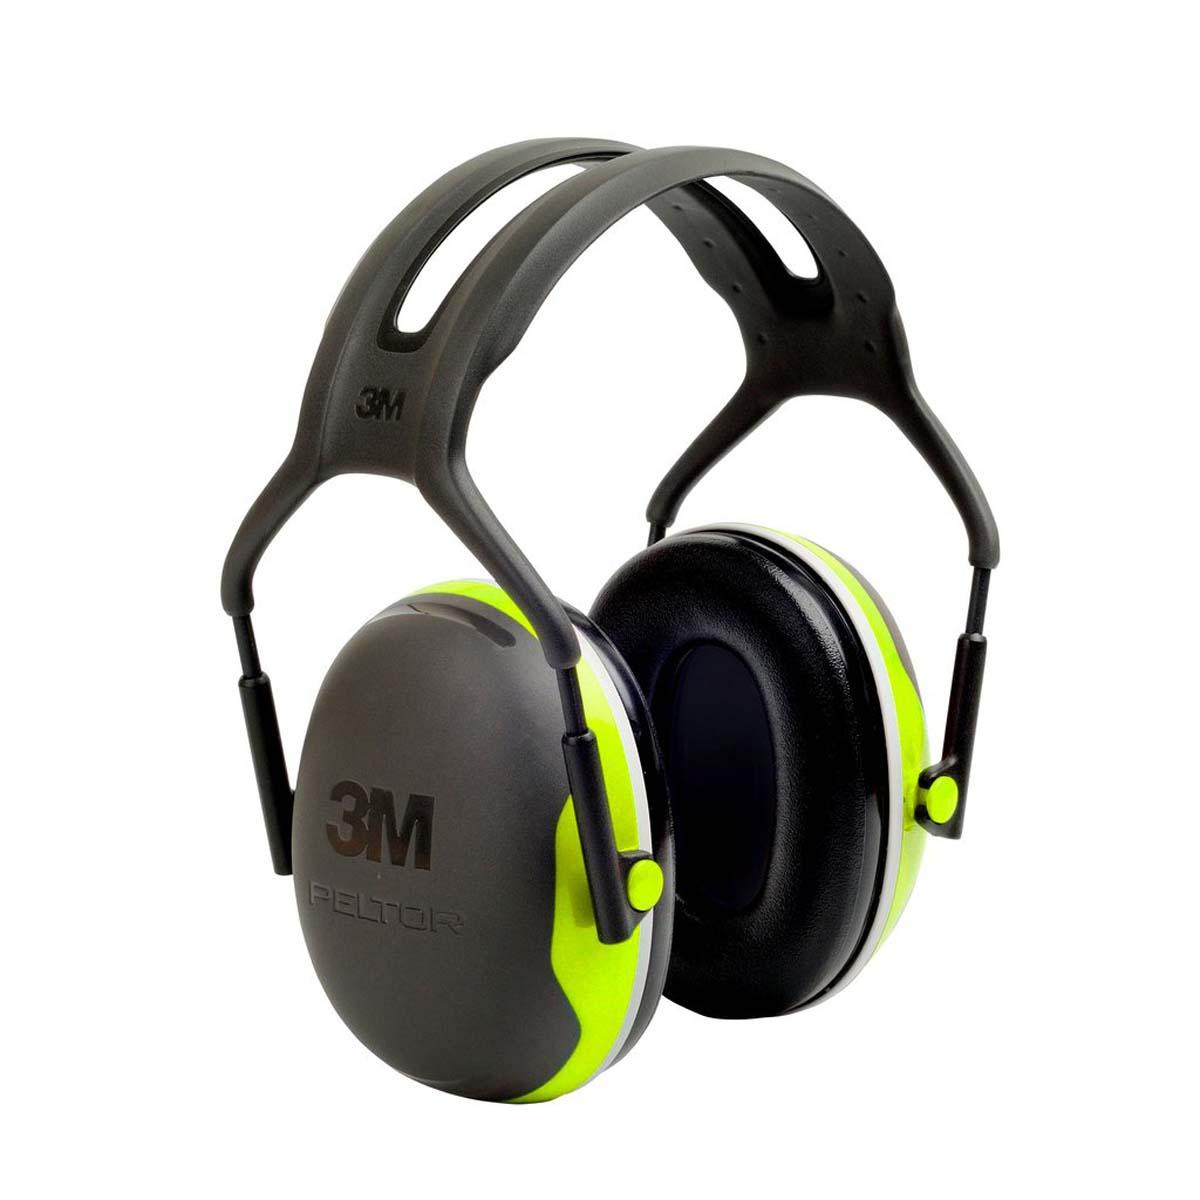 3M PELTOR Over-the-Head Earmuffs X4A/37273(AAD)